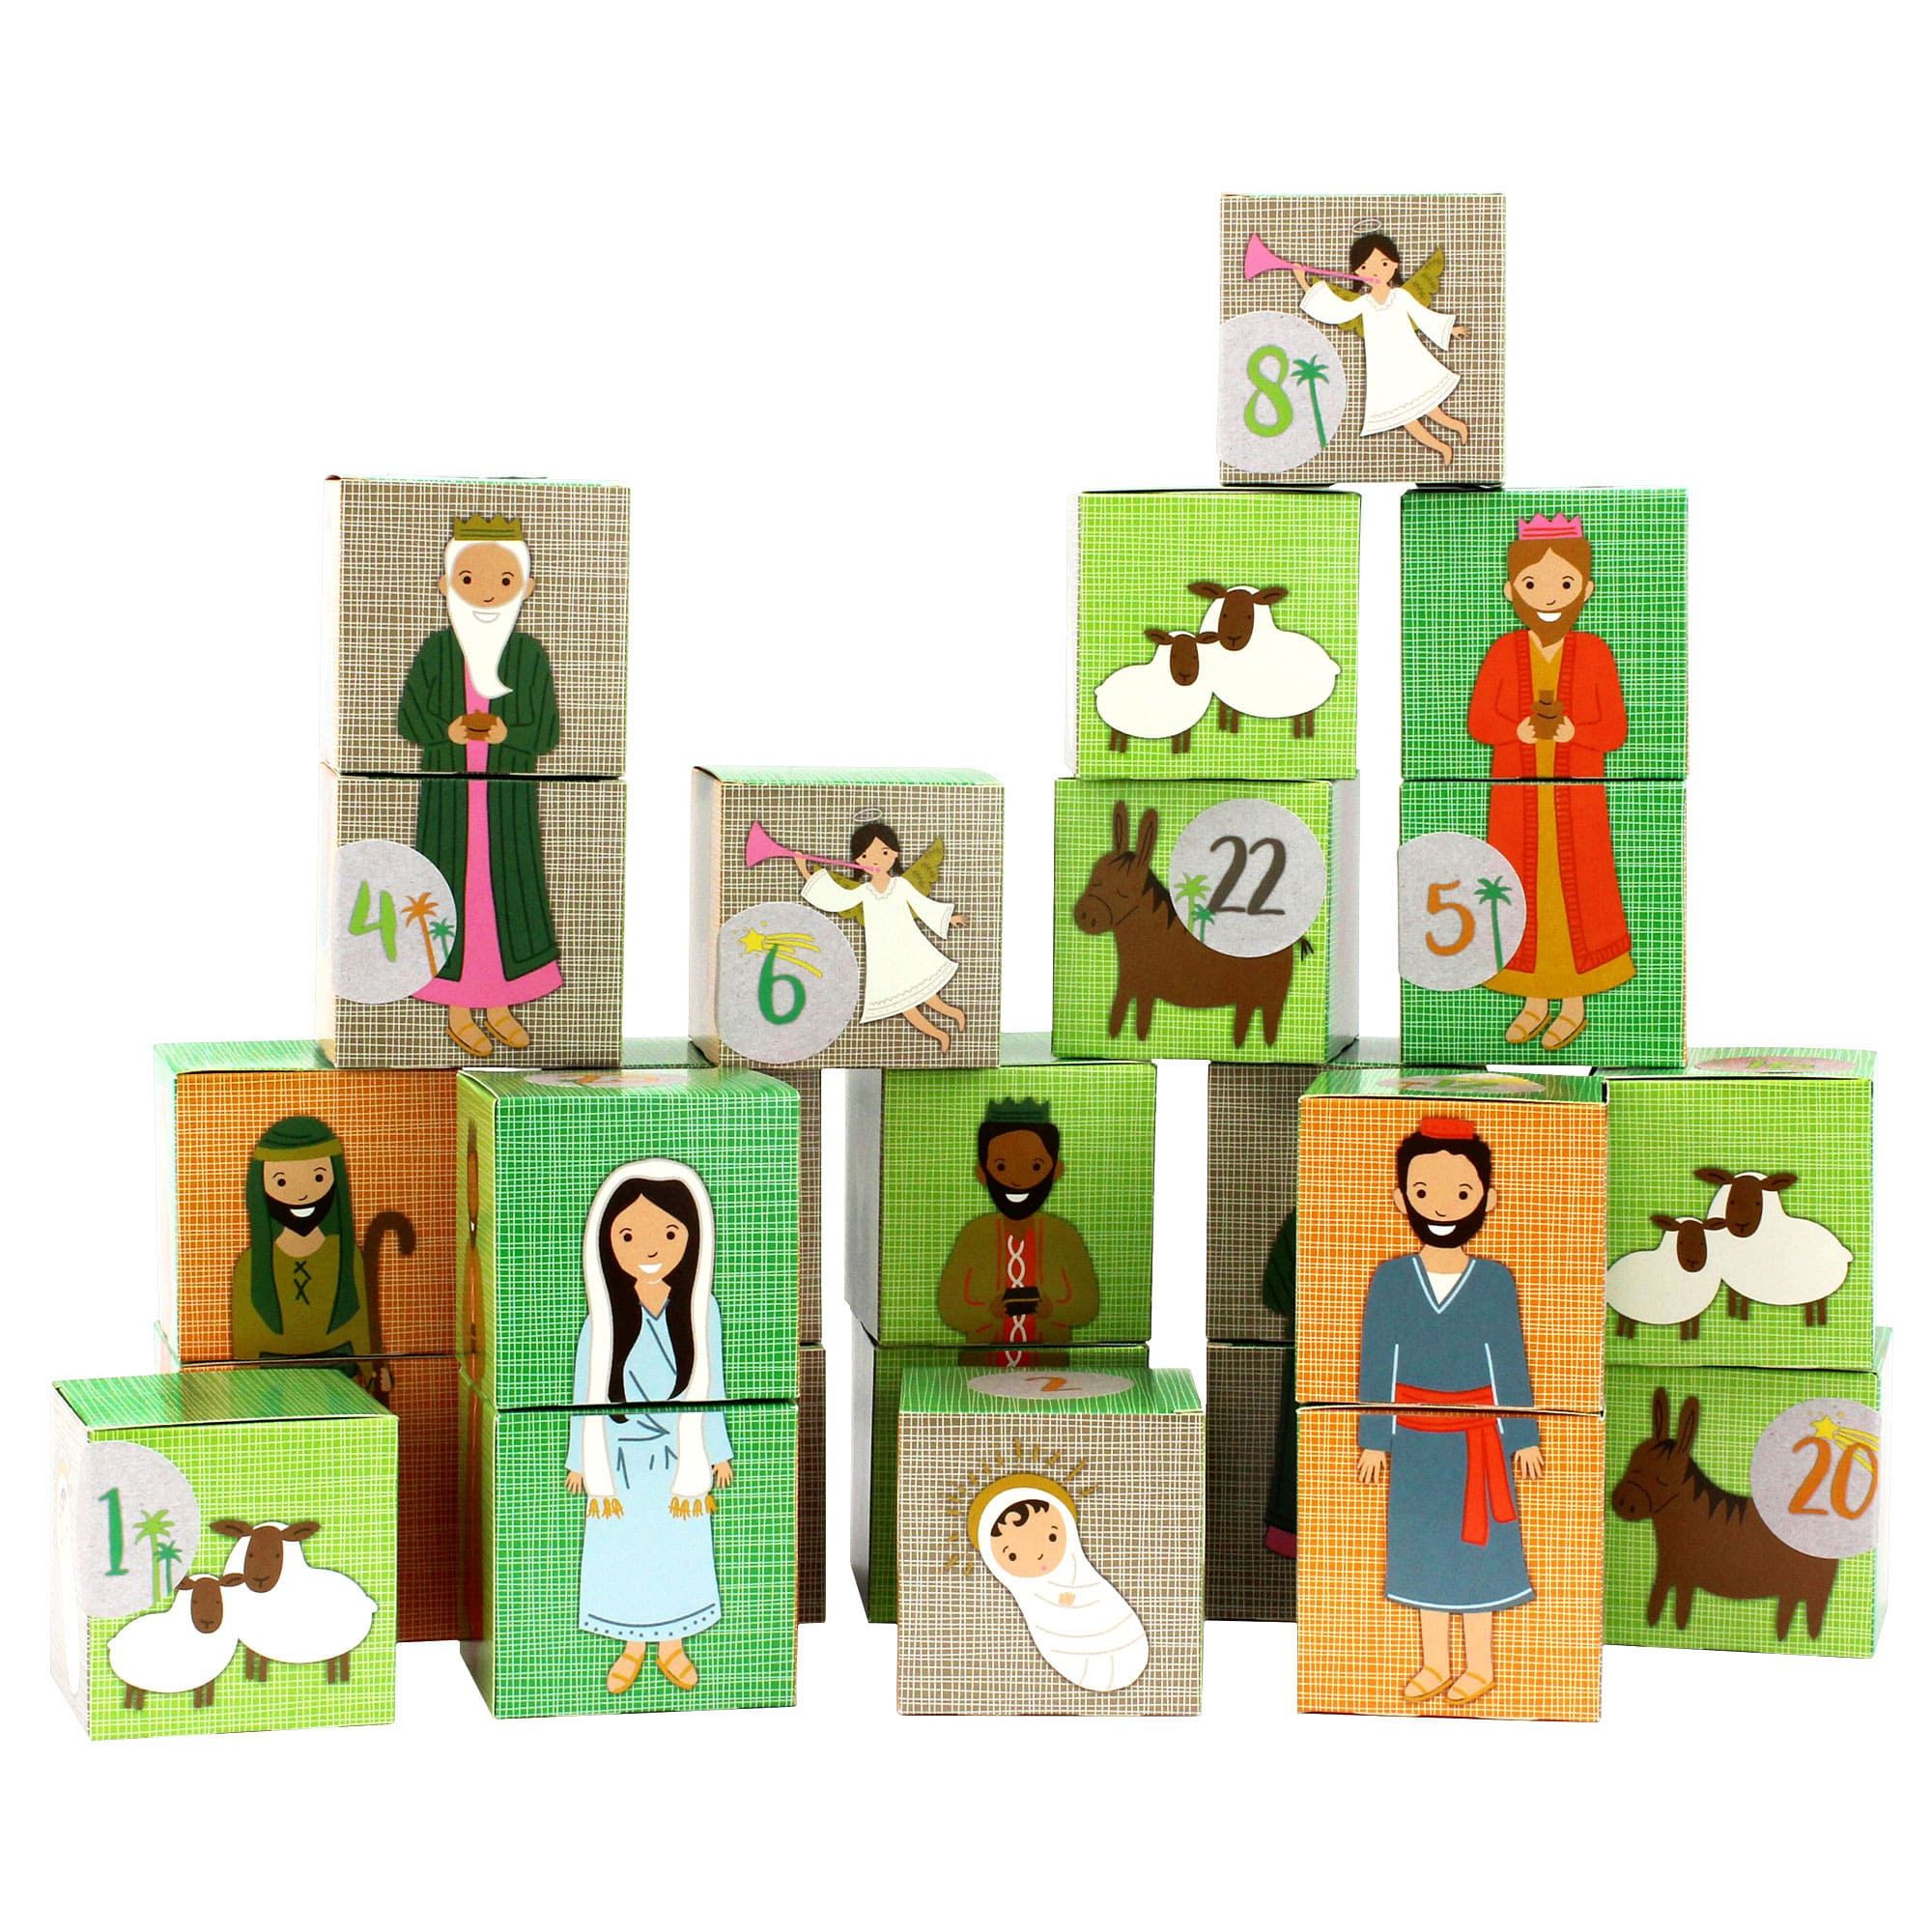 400 041 025 1 Adventskalender Online Geschenkidee Kinder